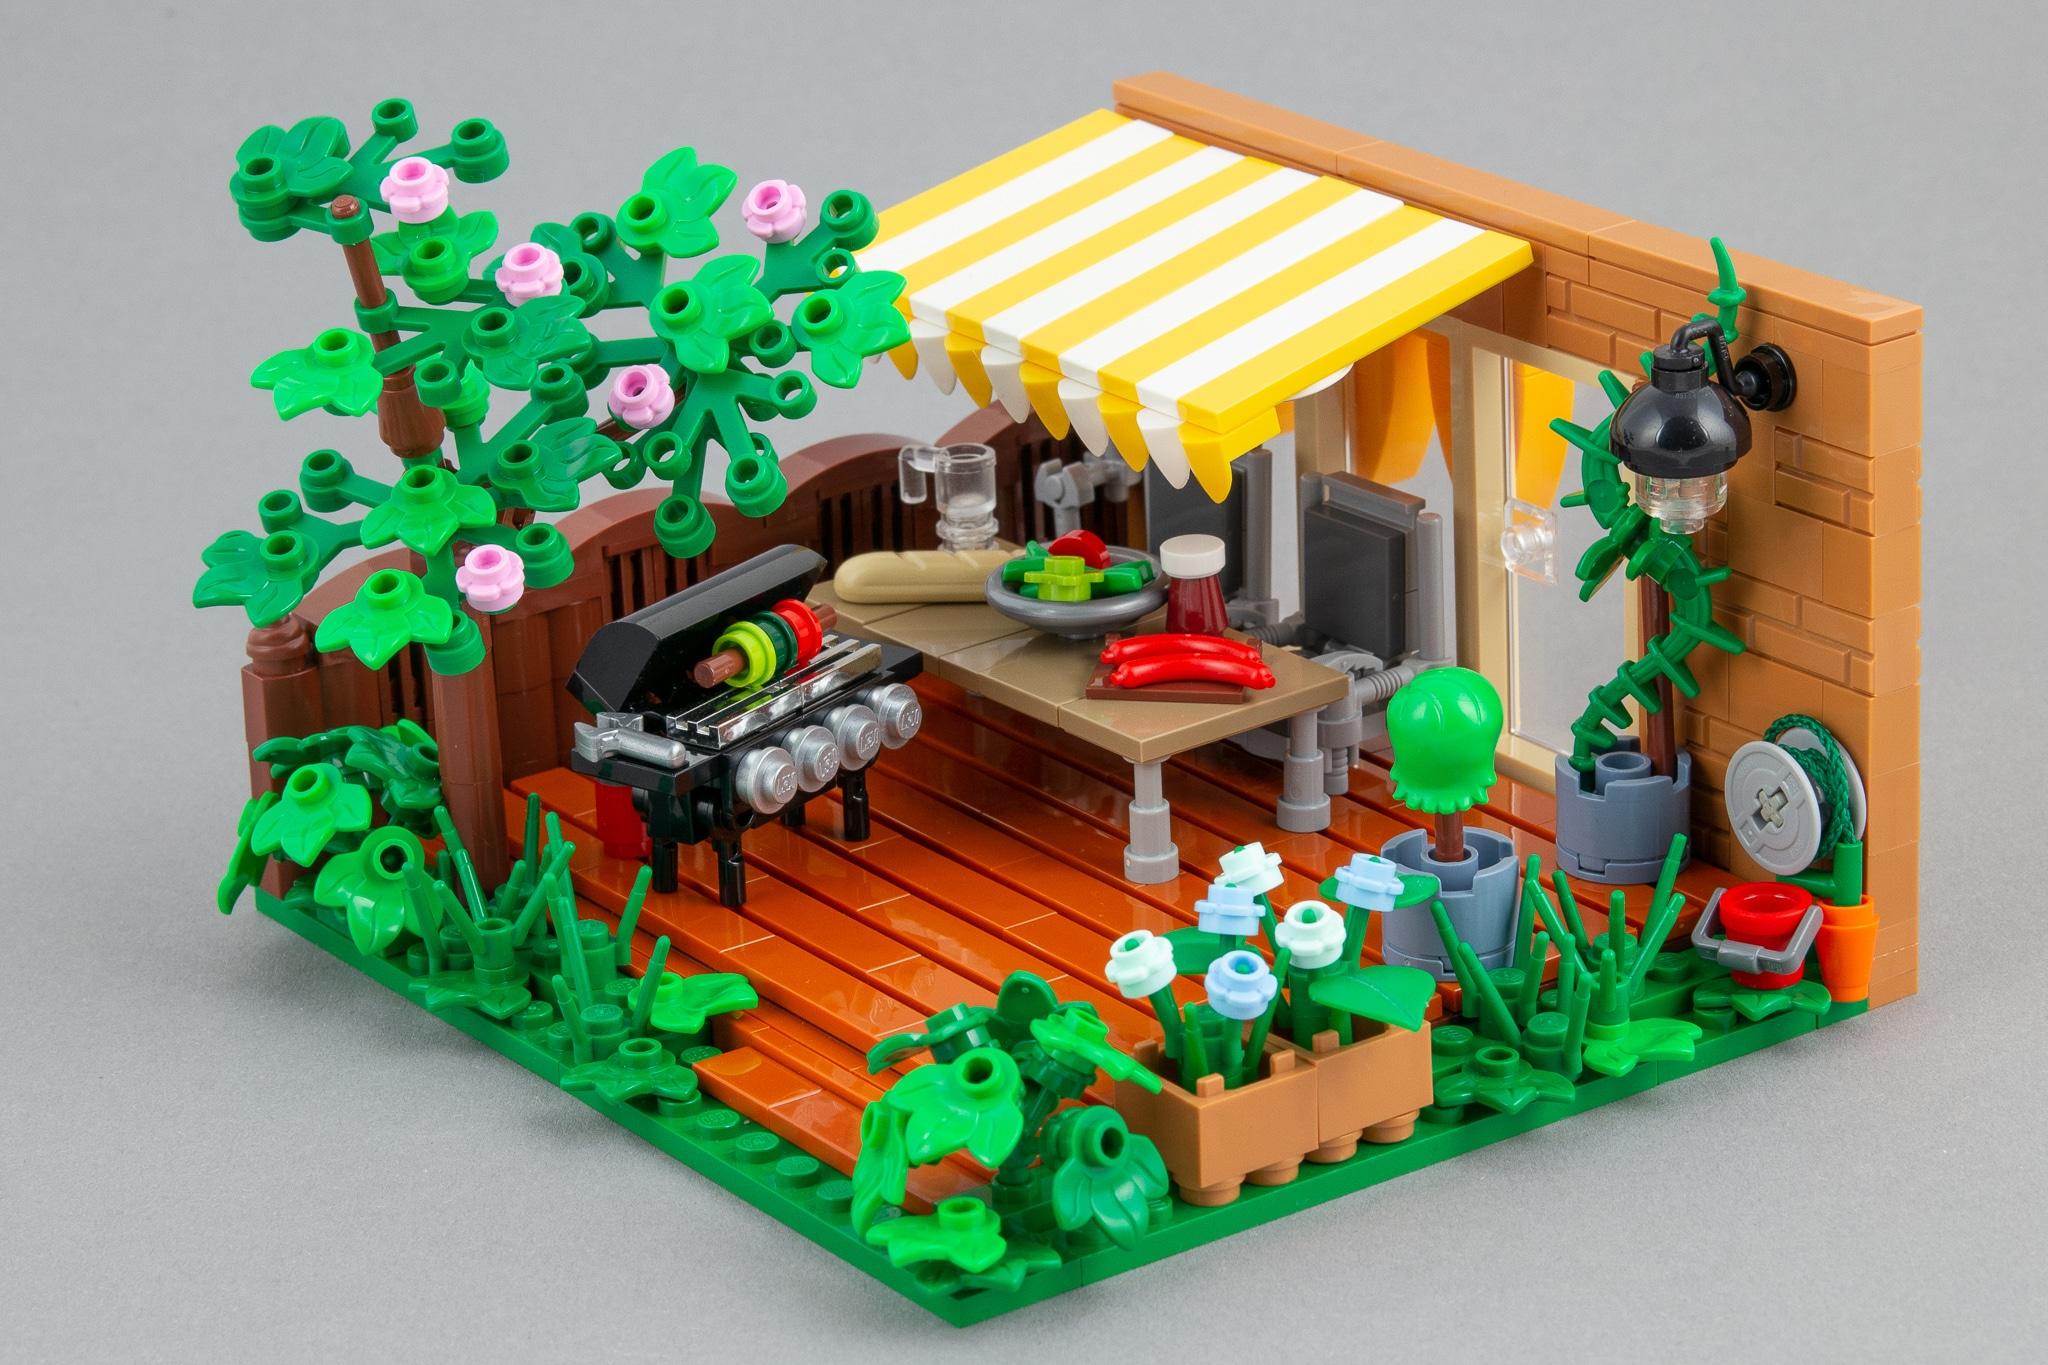 LEGO Moc Terrasse